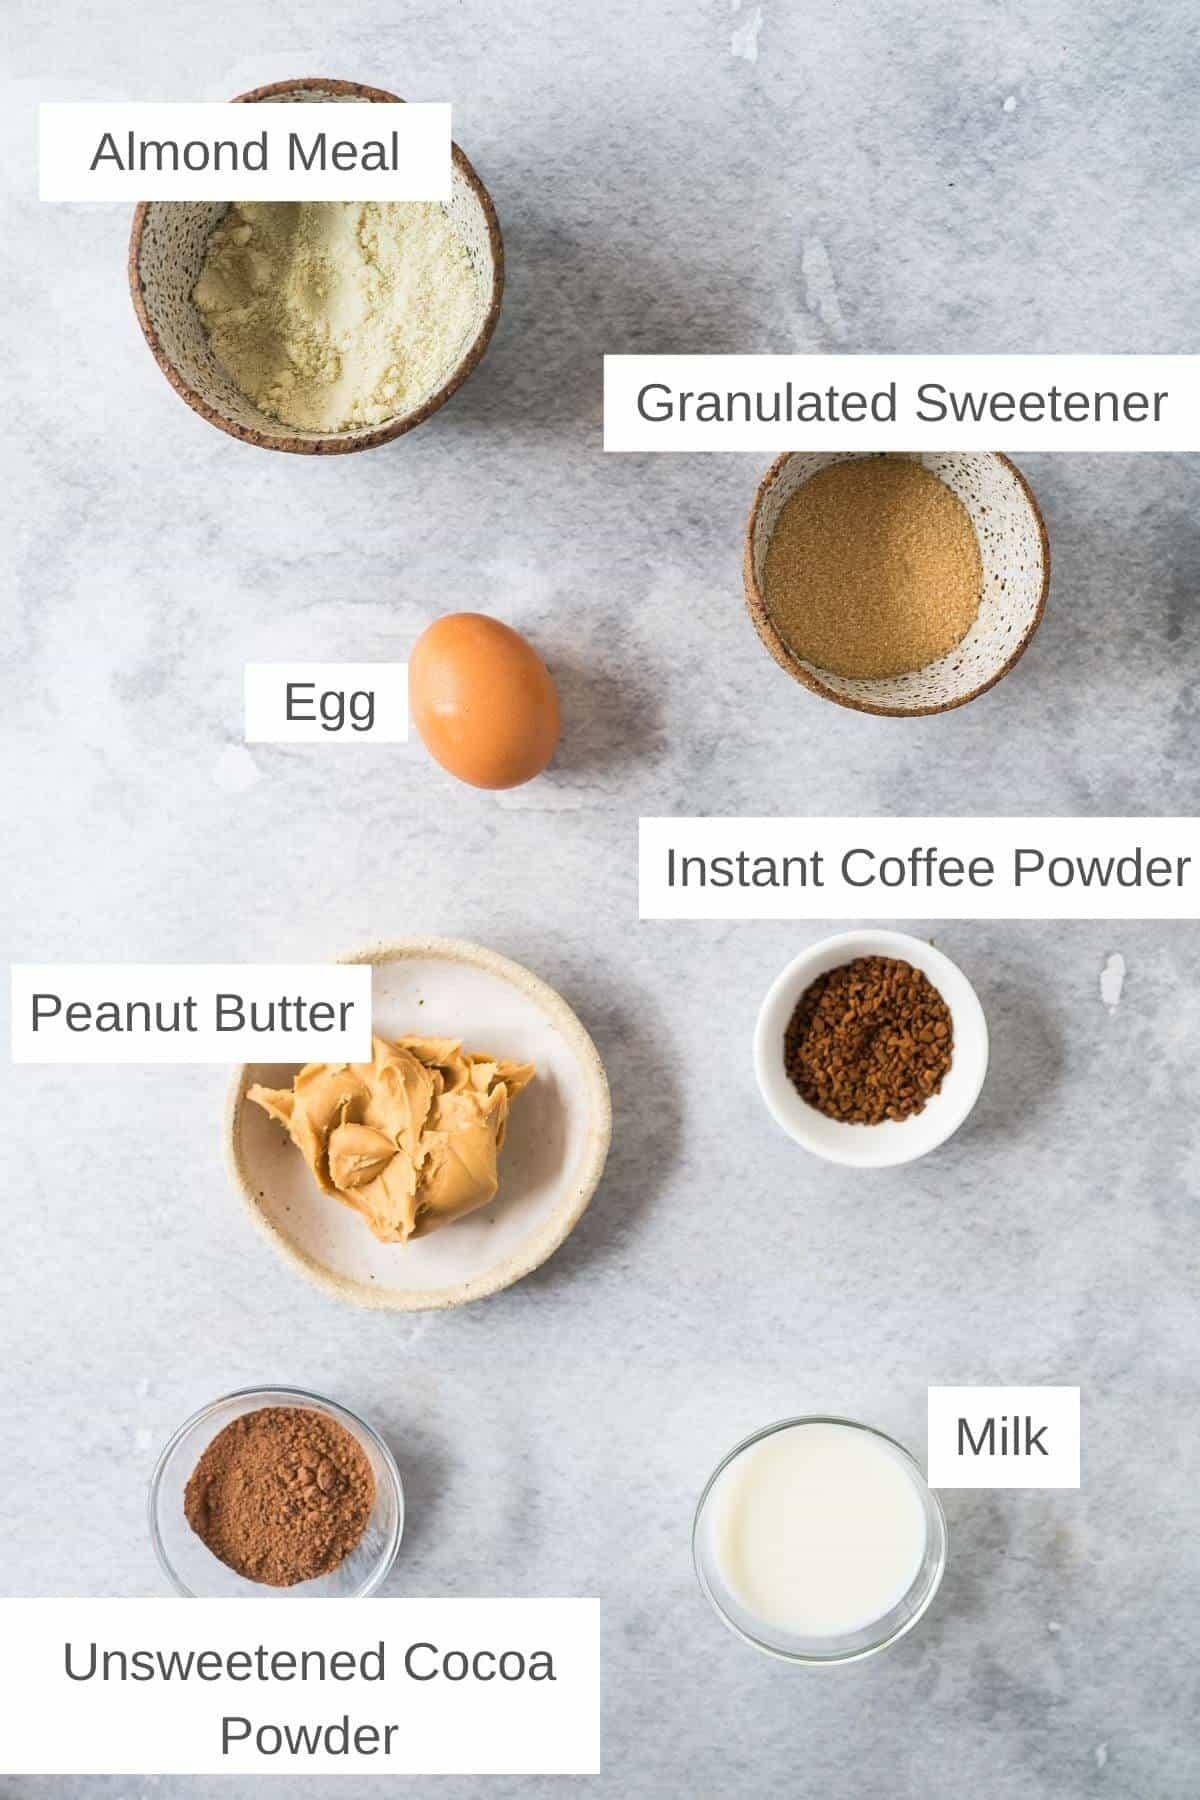 ingredients for chocolate peanut butter mug cake